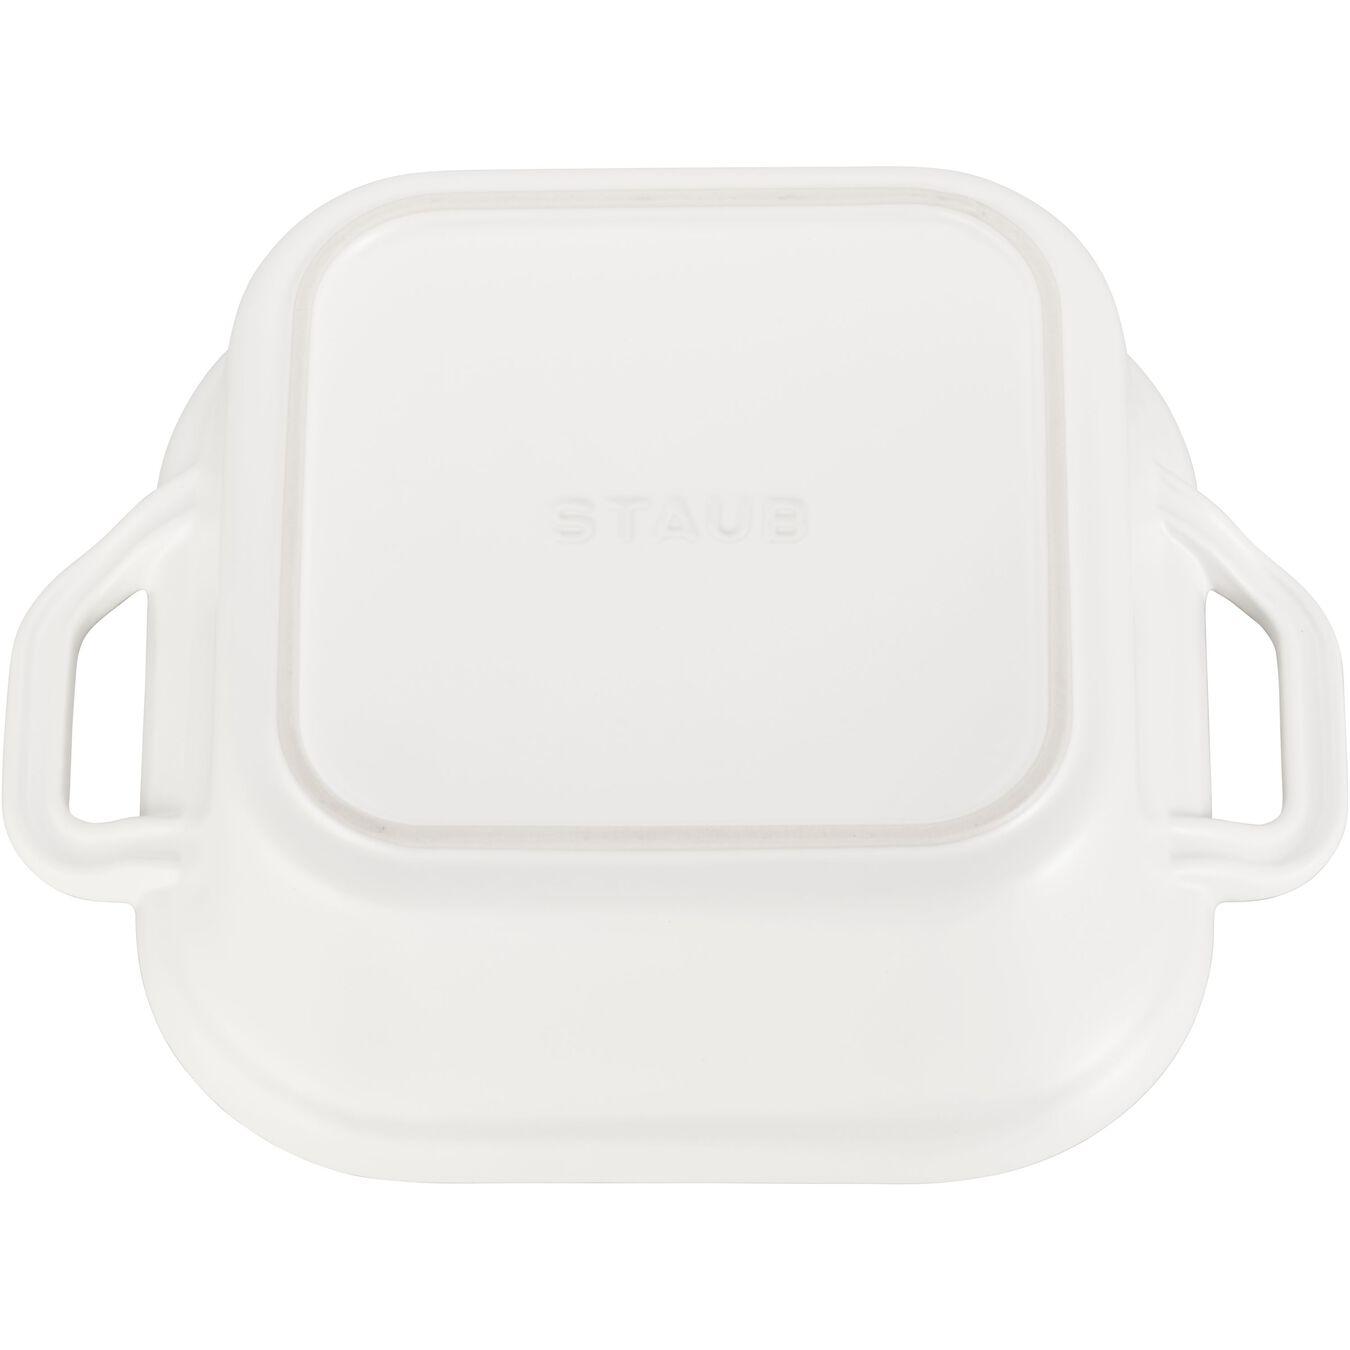 Ceramic square Special shape bakeware, matte-white,,large 3